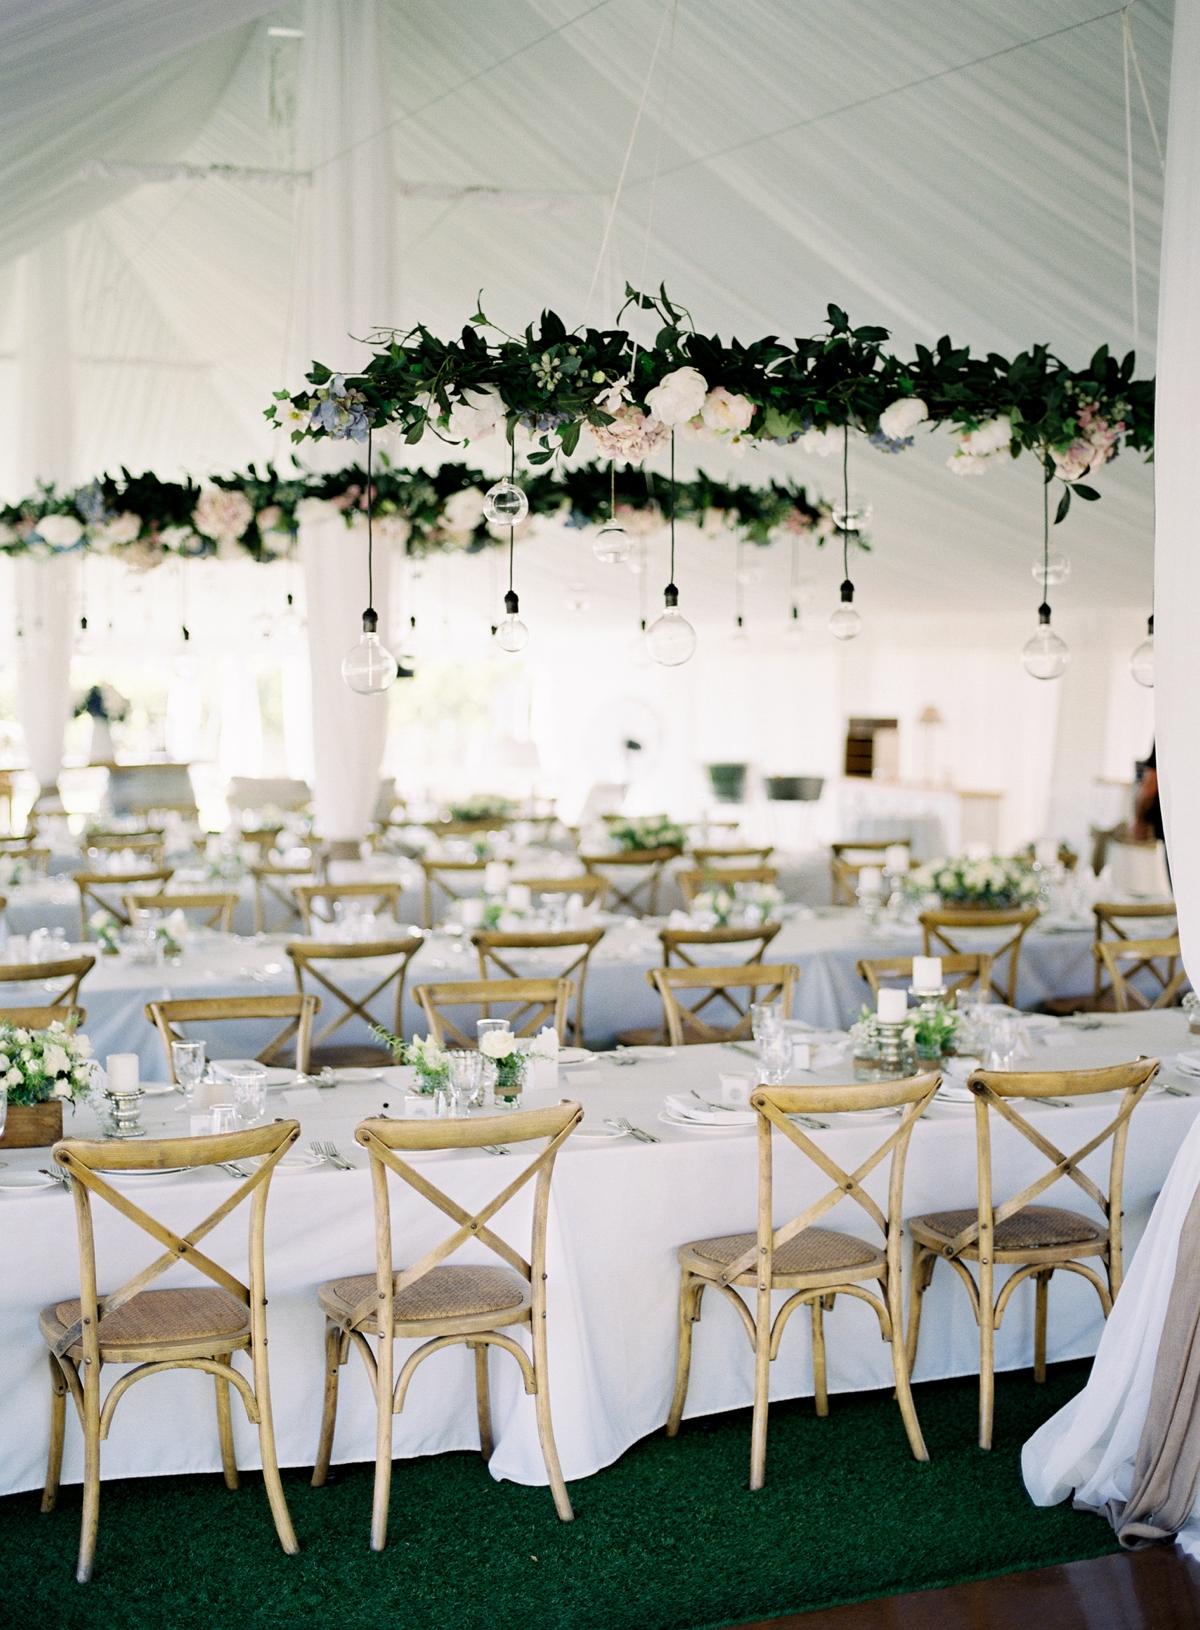 The Vinegrove Mudgee A photographers favourite wedding venues033.jpg